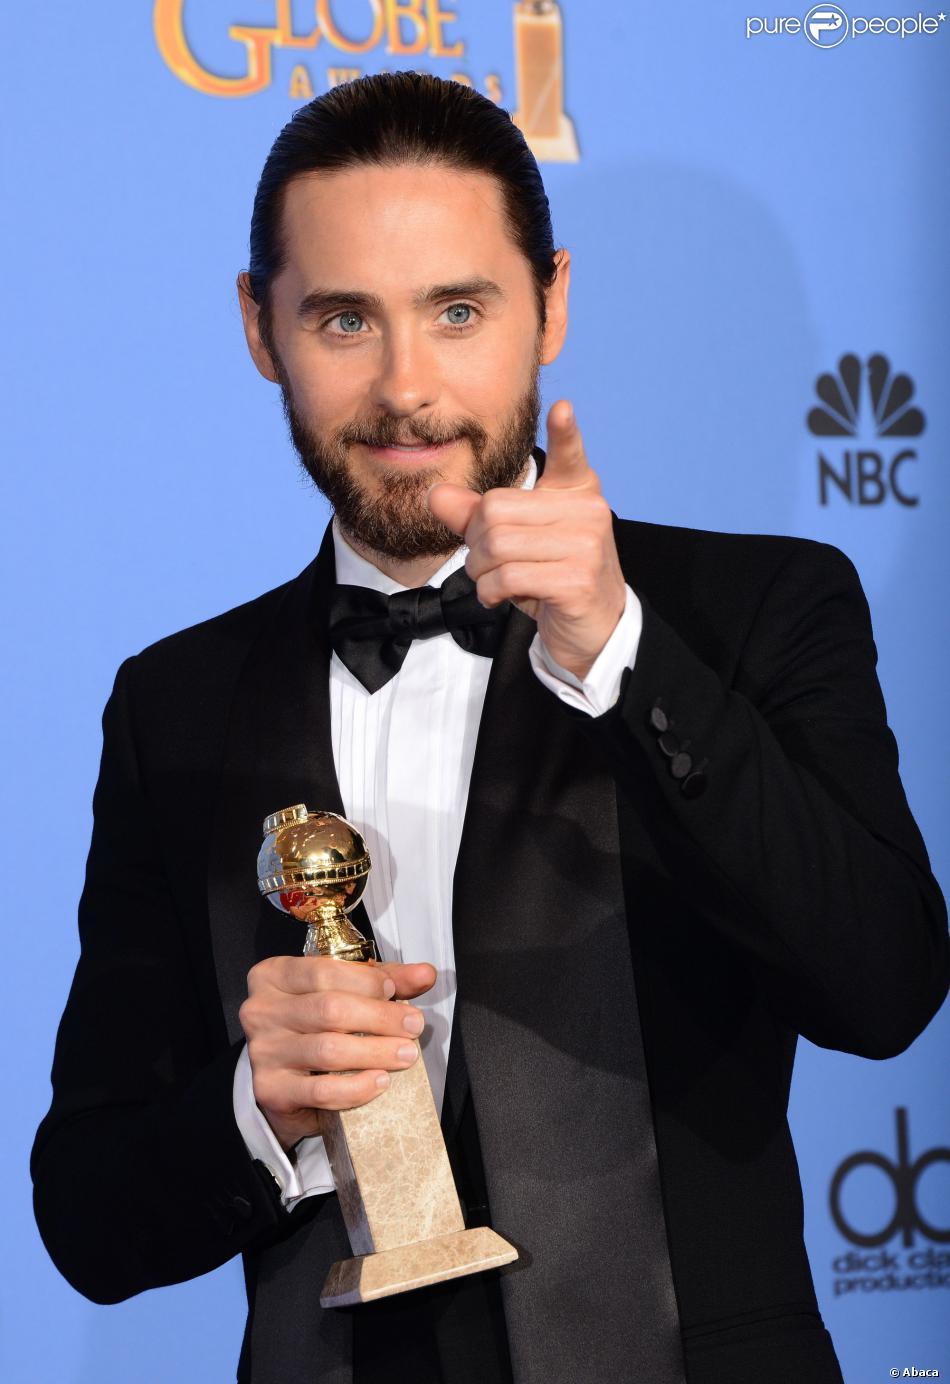 Jared Leto aux Golden Globe Awards le 12 janvier 2014.